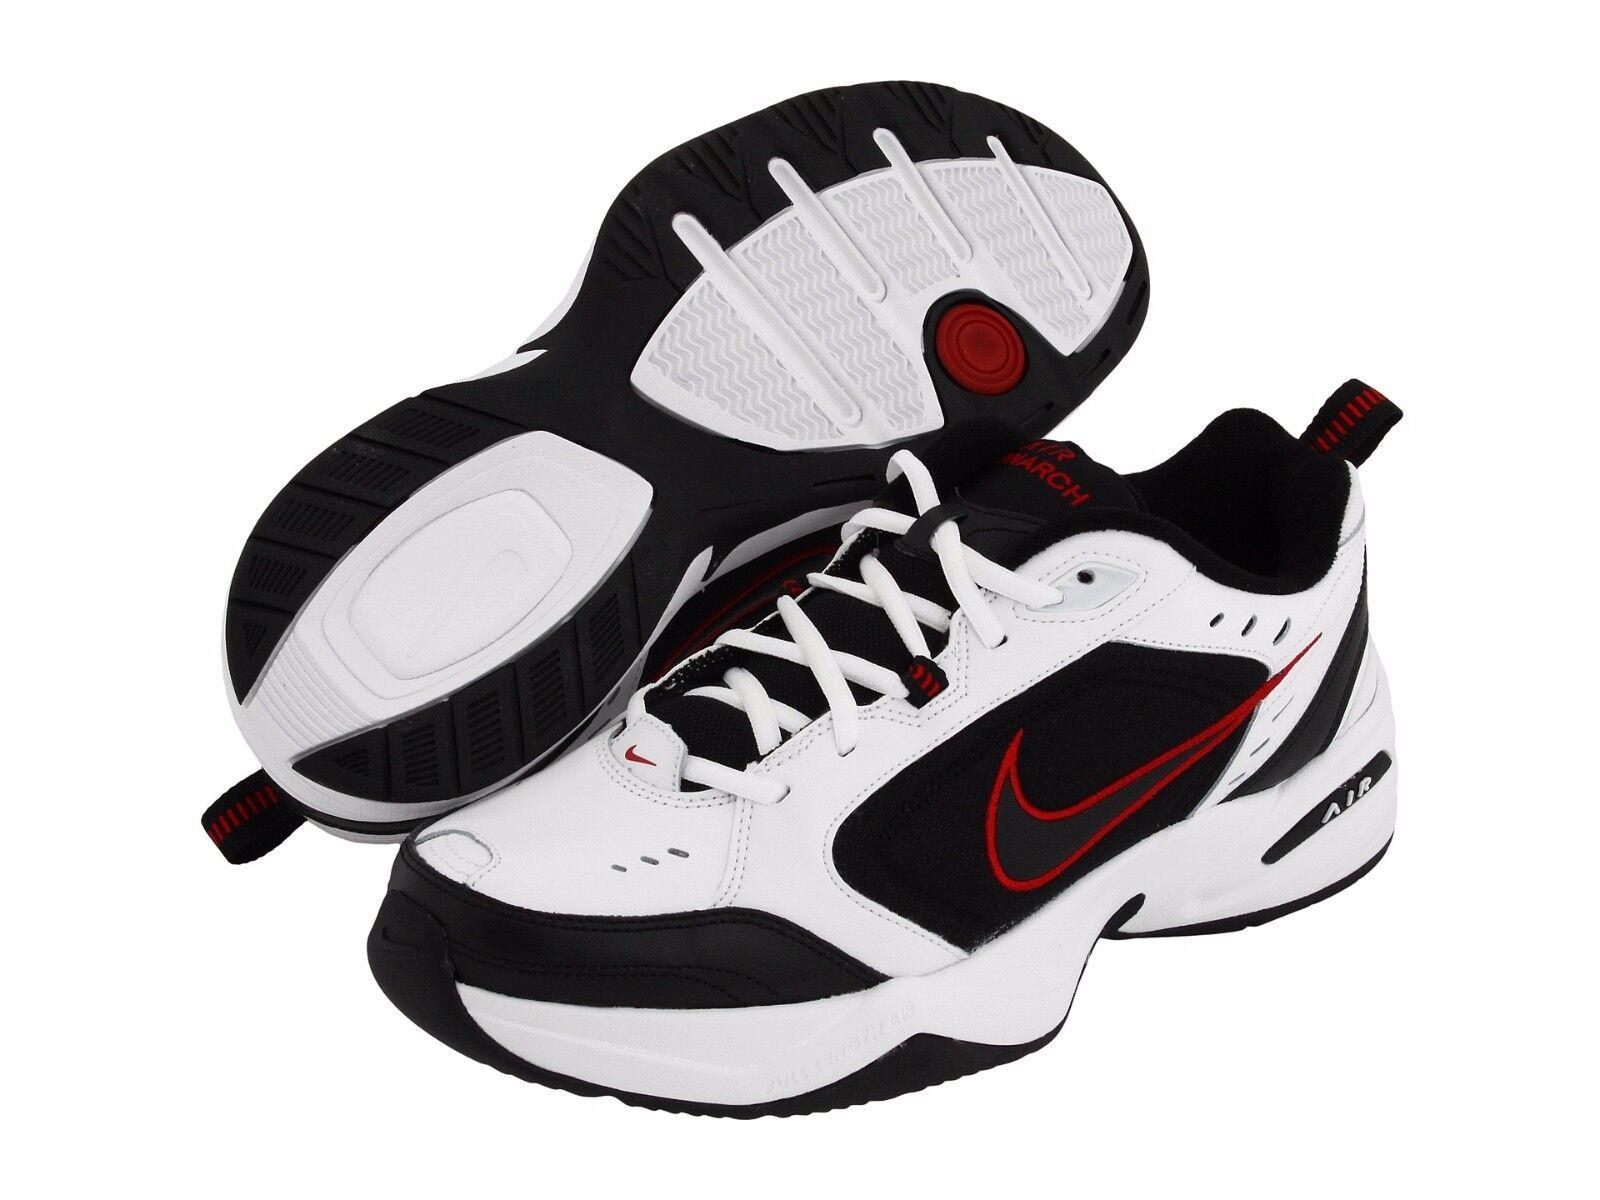 NIB Men's Nike Air Monarch 4 Running & Shoes Torch Med & Running 4E Width Dynasty WhRed dcbaa4